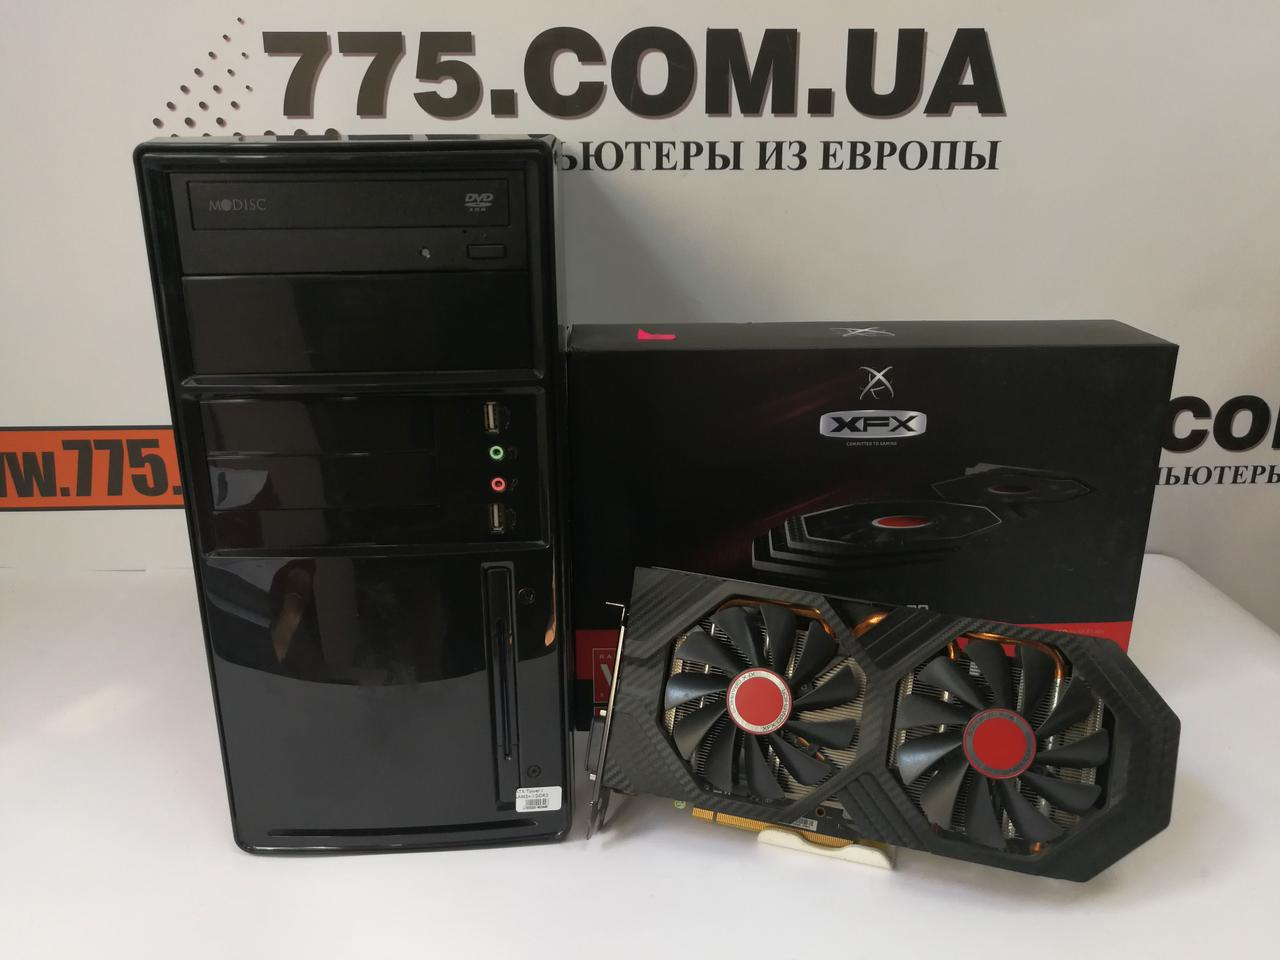 Игровой компьютер, AMD FX6100 3.9ГГц, RAM 8ГБ, HDD 500ГБ, Radeon RX 470 4ГБ